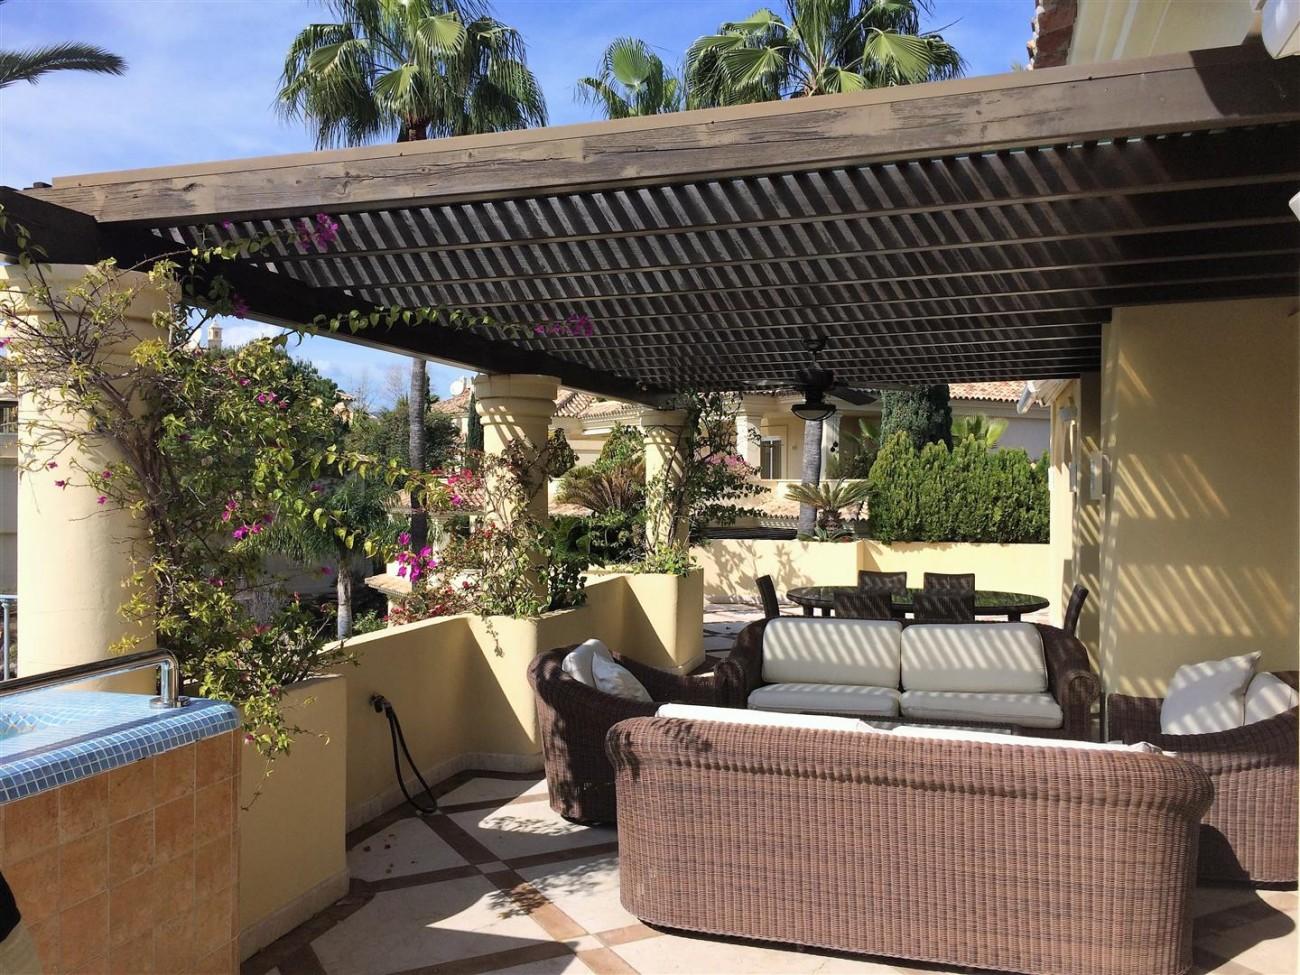 Penthouse for sale Las Alamandas Nueva Andalucia Marbella Spain (36) (Large)